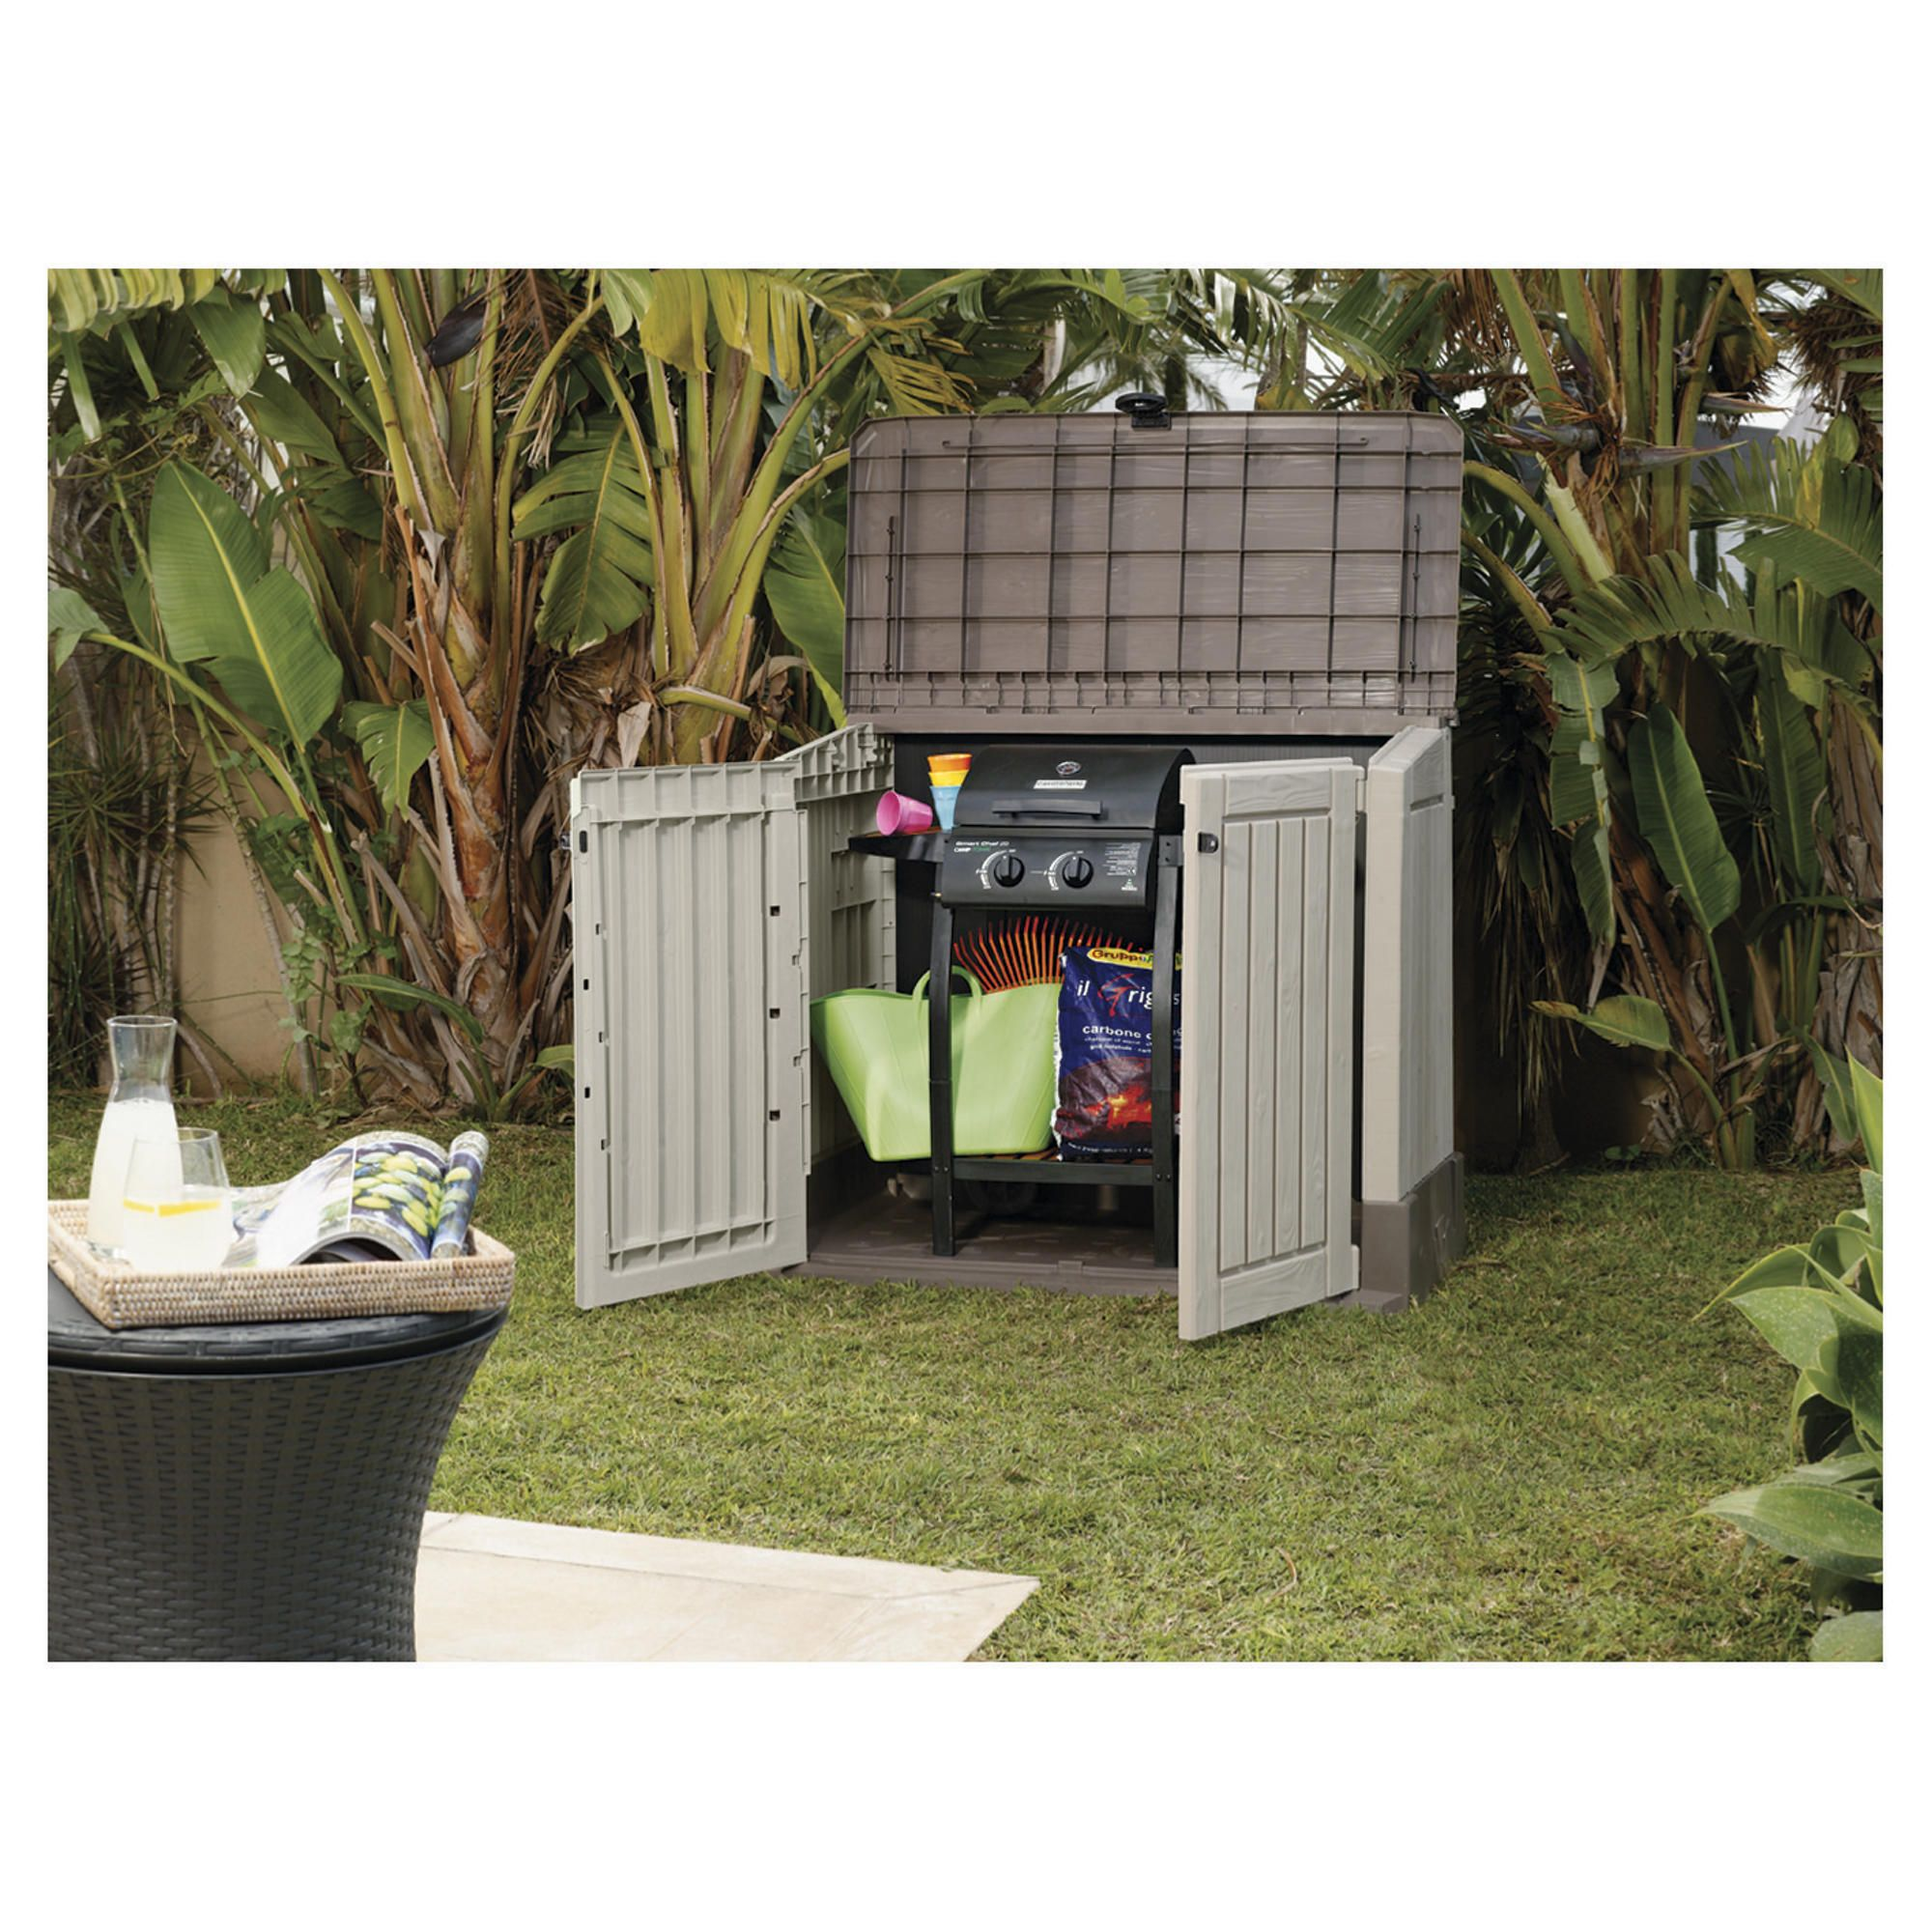 Sharty argos garden storage sheds for Garden shed tesco